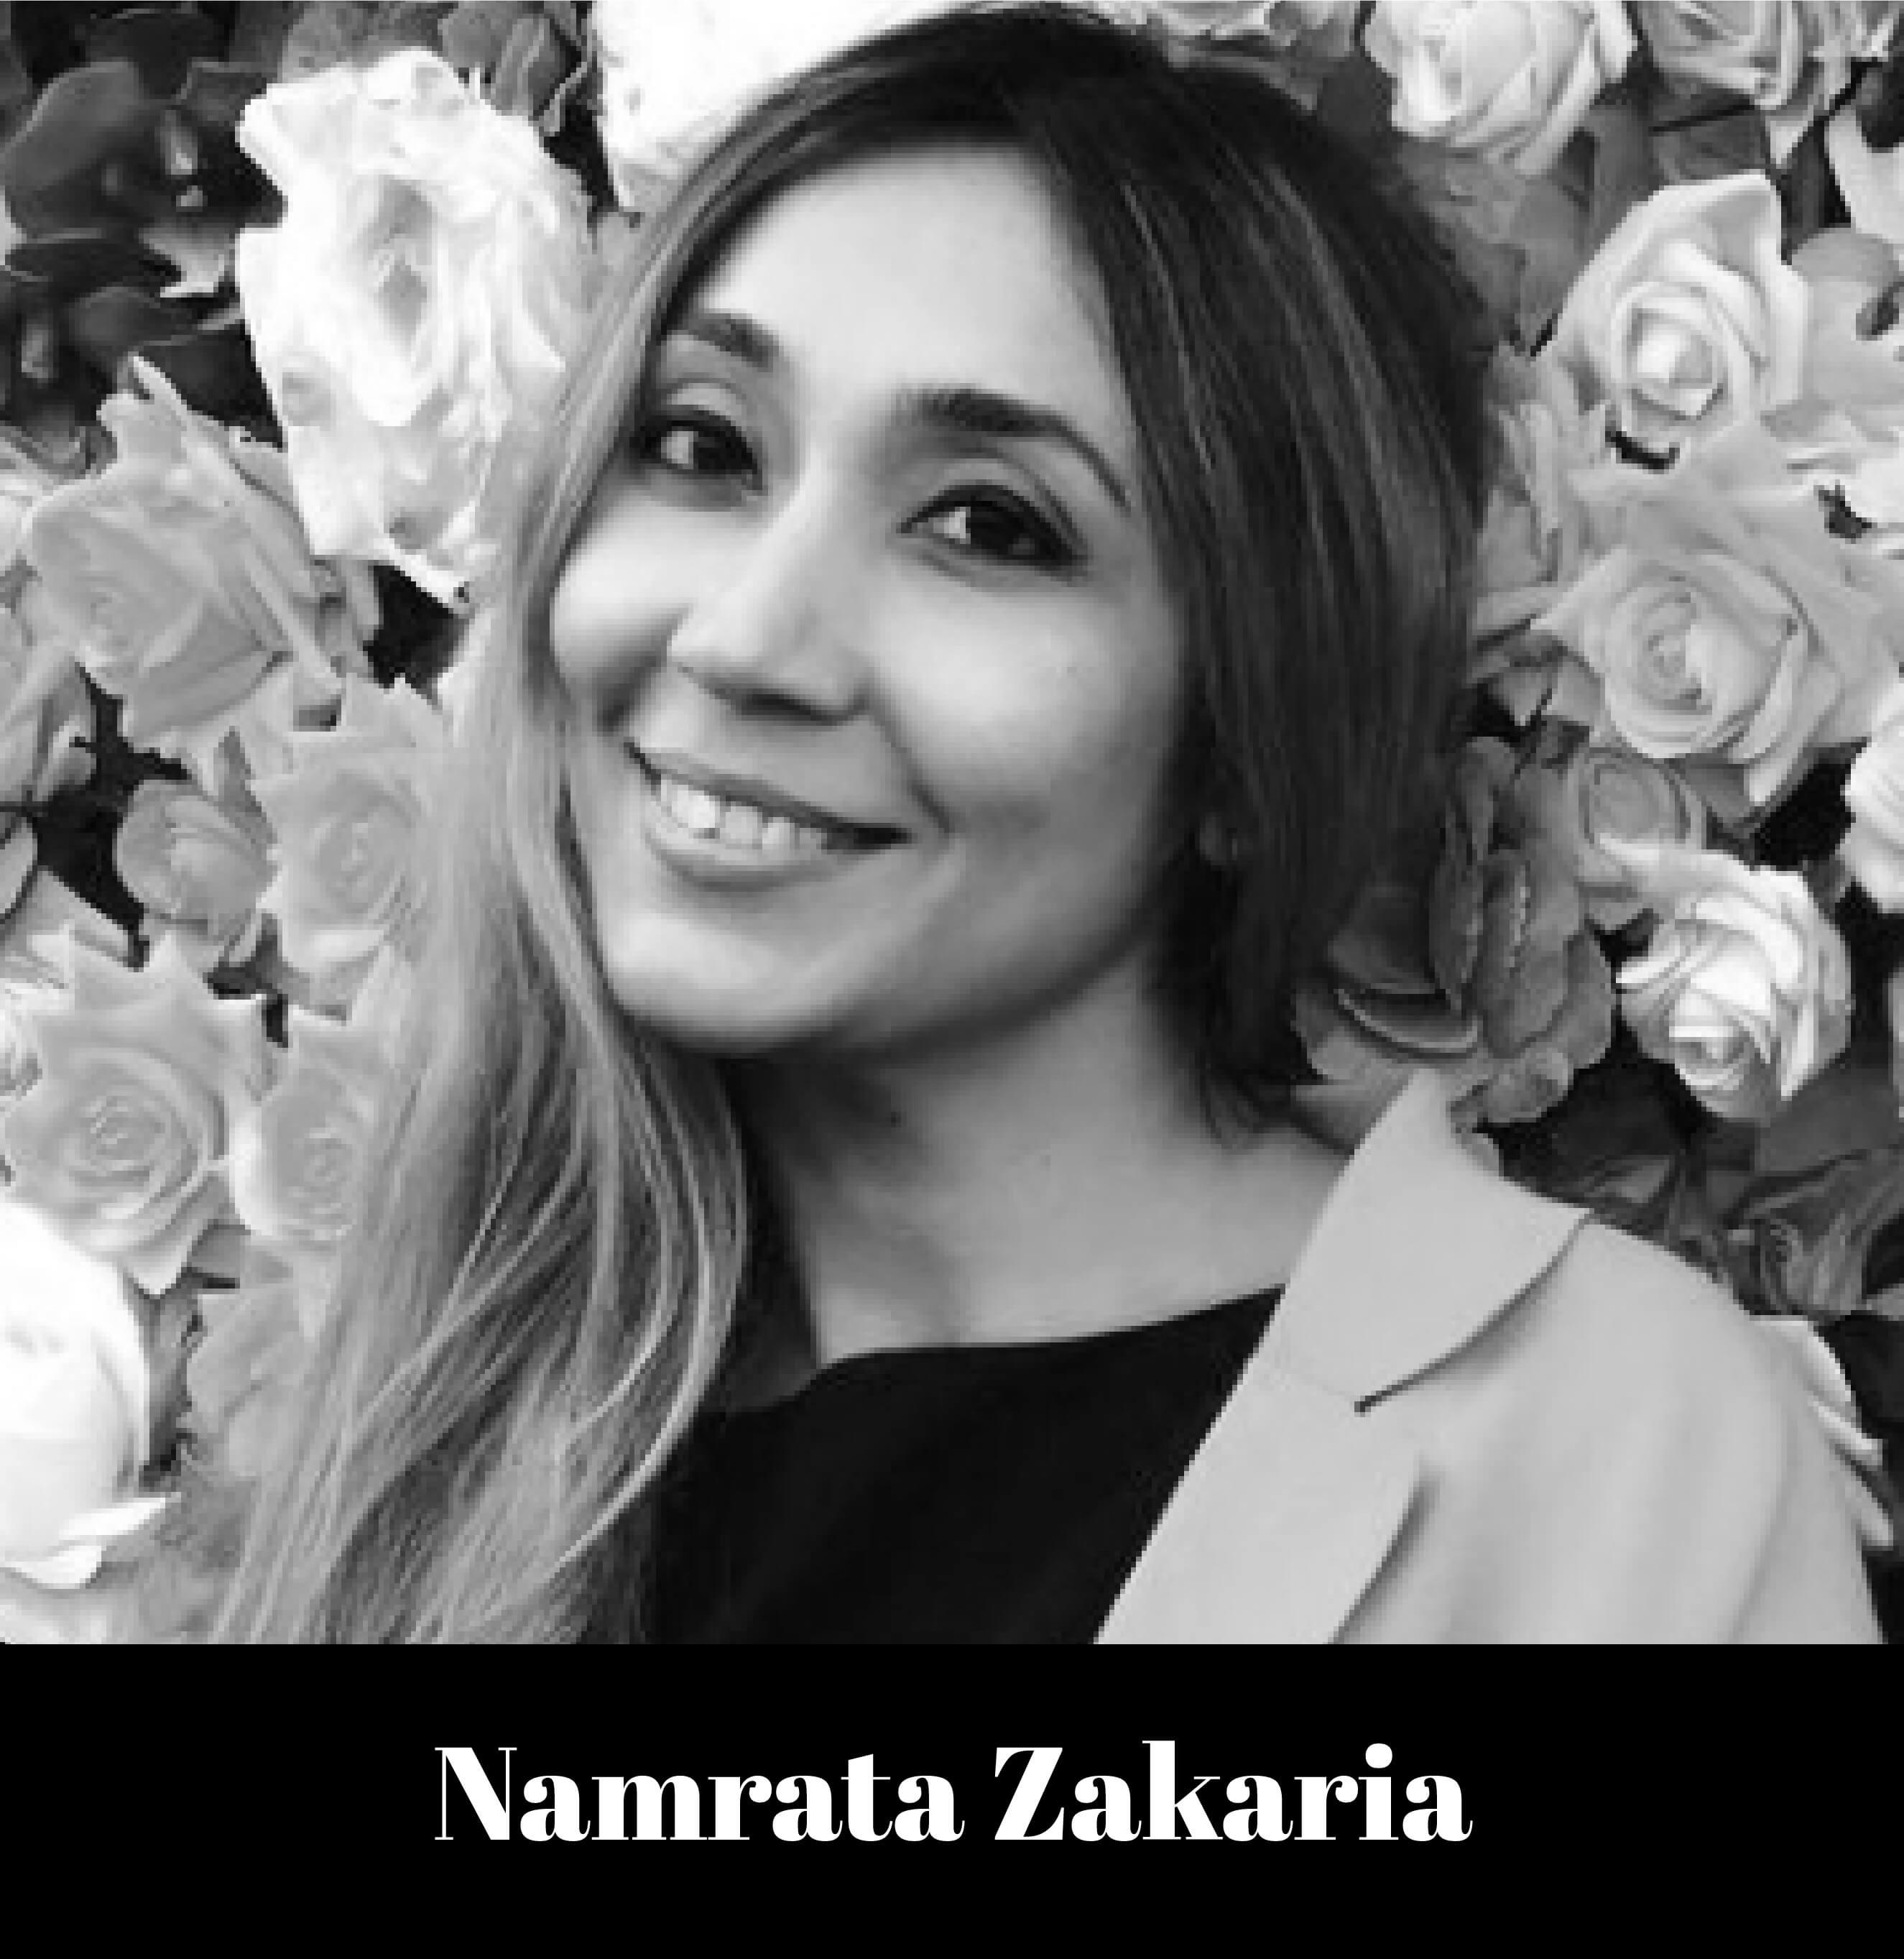 Namrata-Zakaria_1.jpg